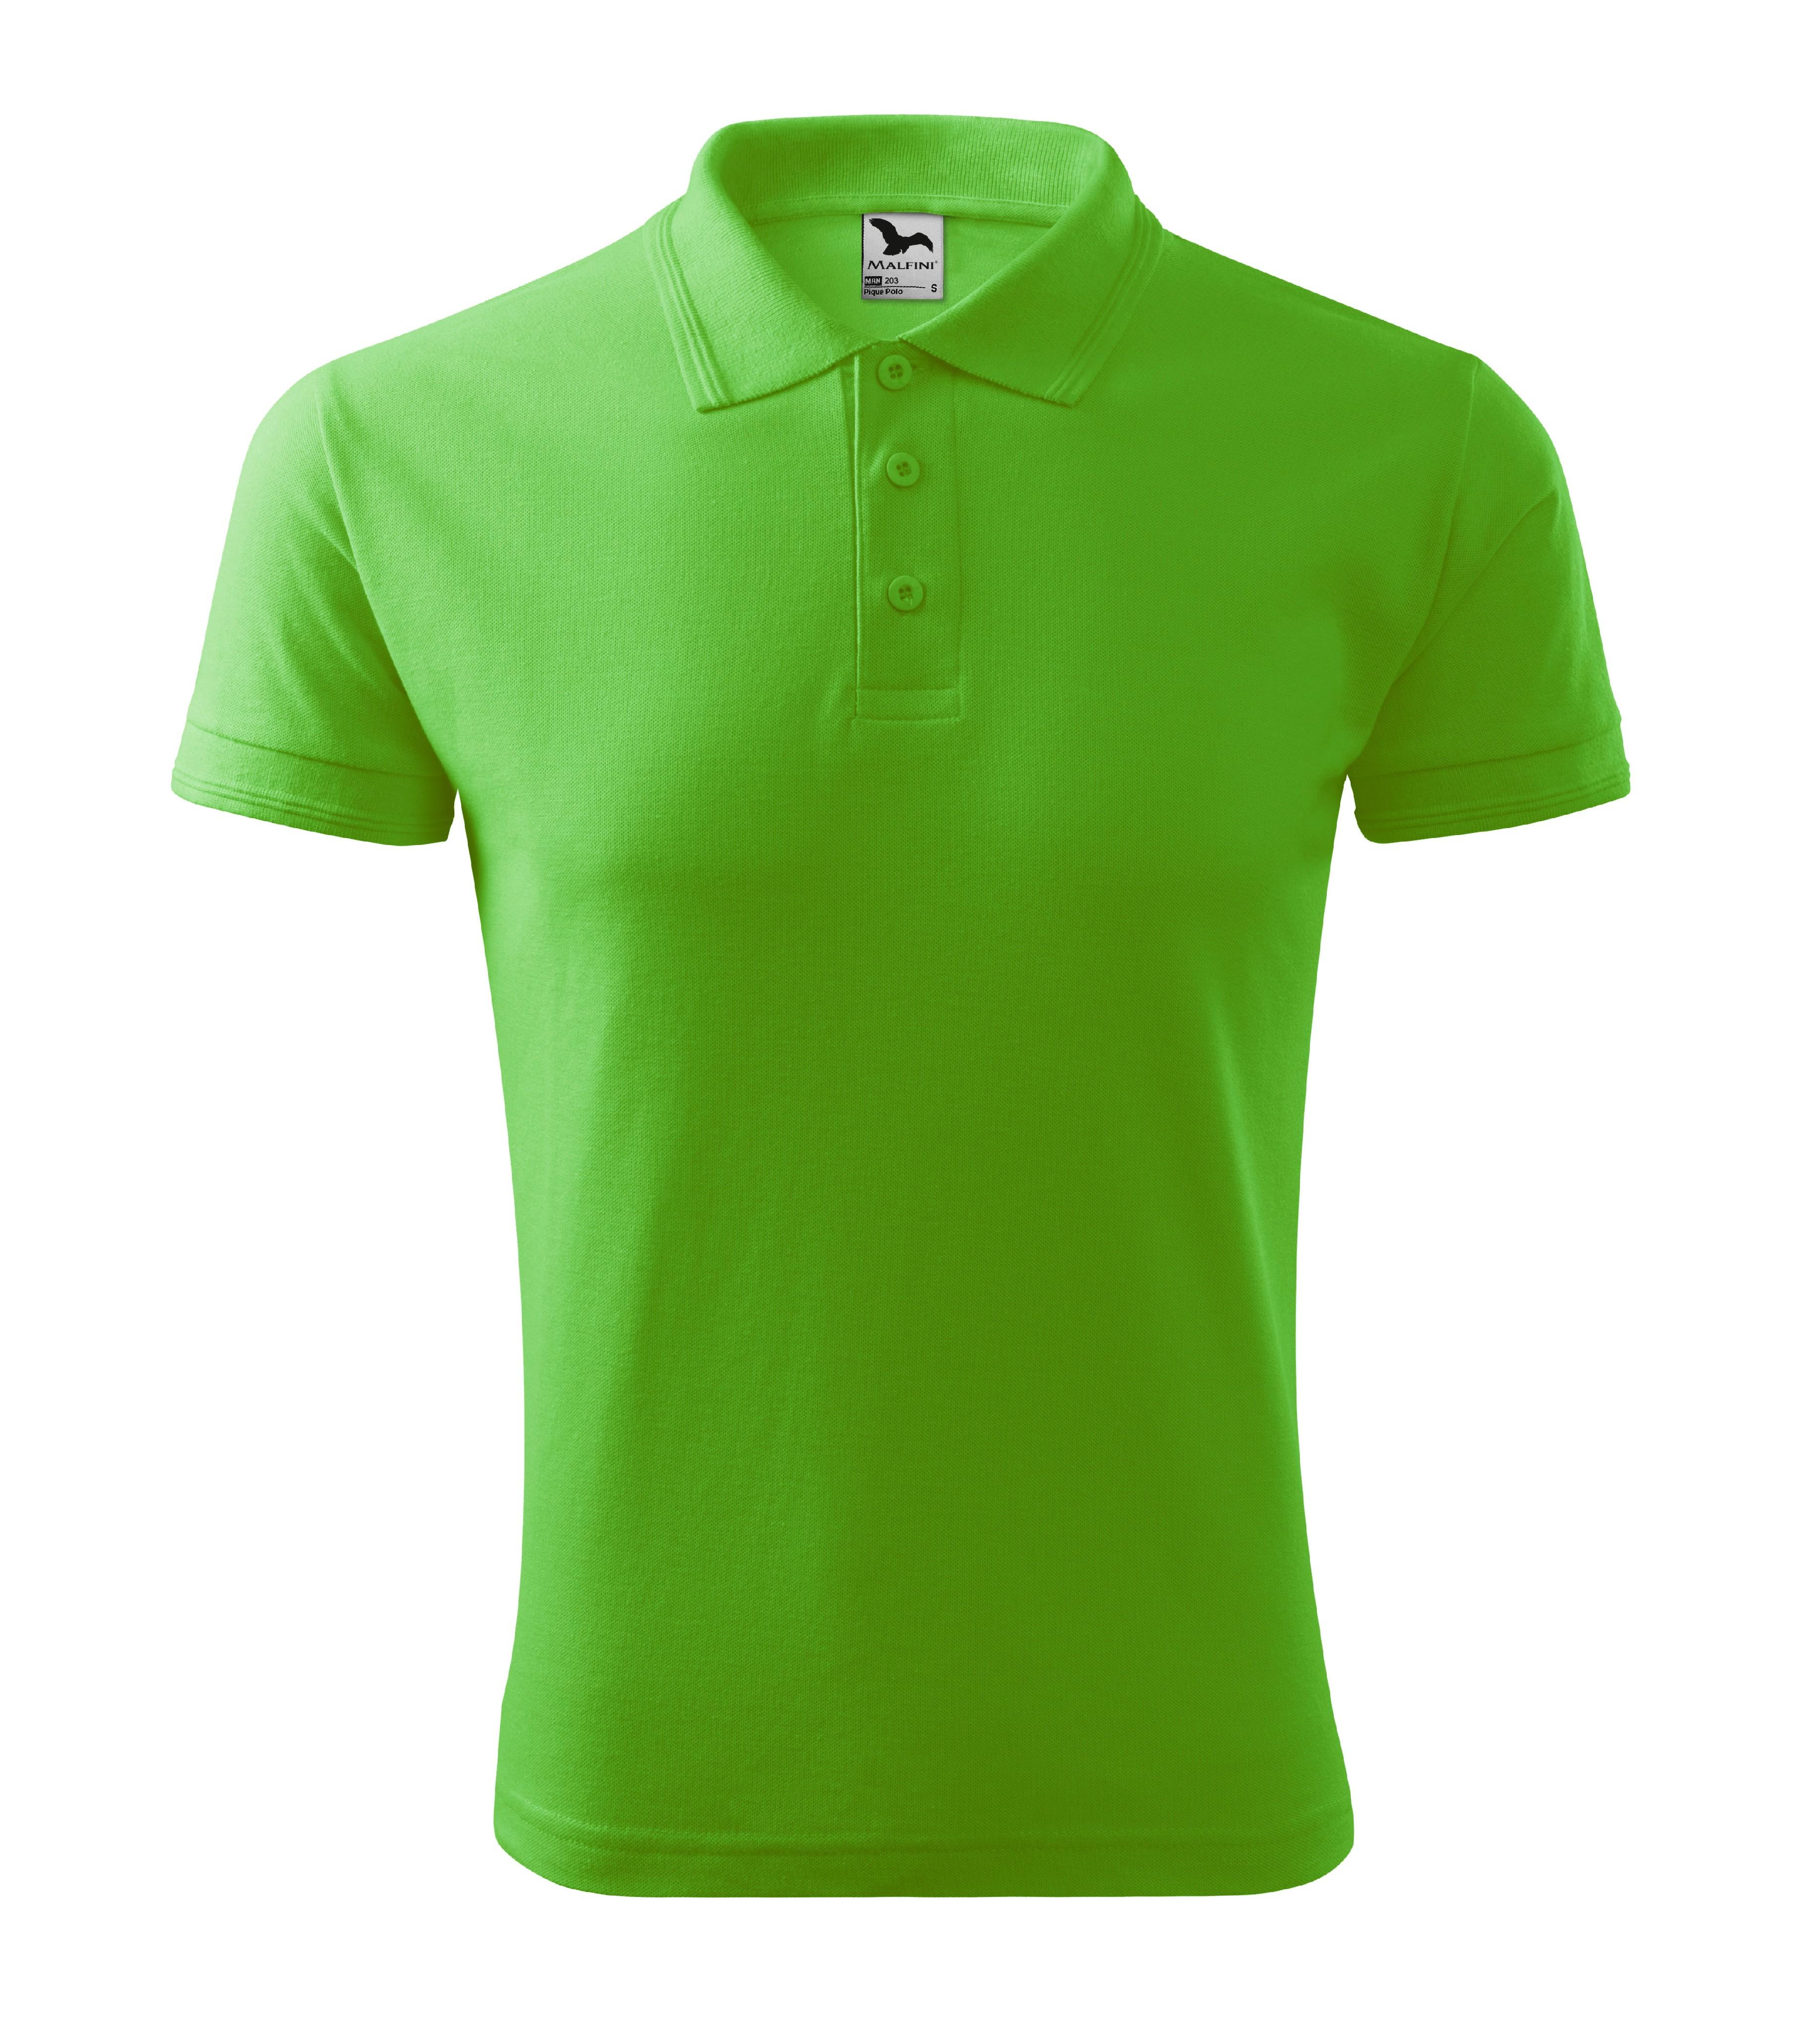 Polokošile pánská Pique Polo Barva: apple green, Velikost: L